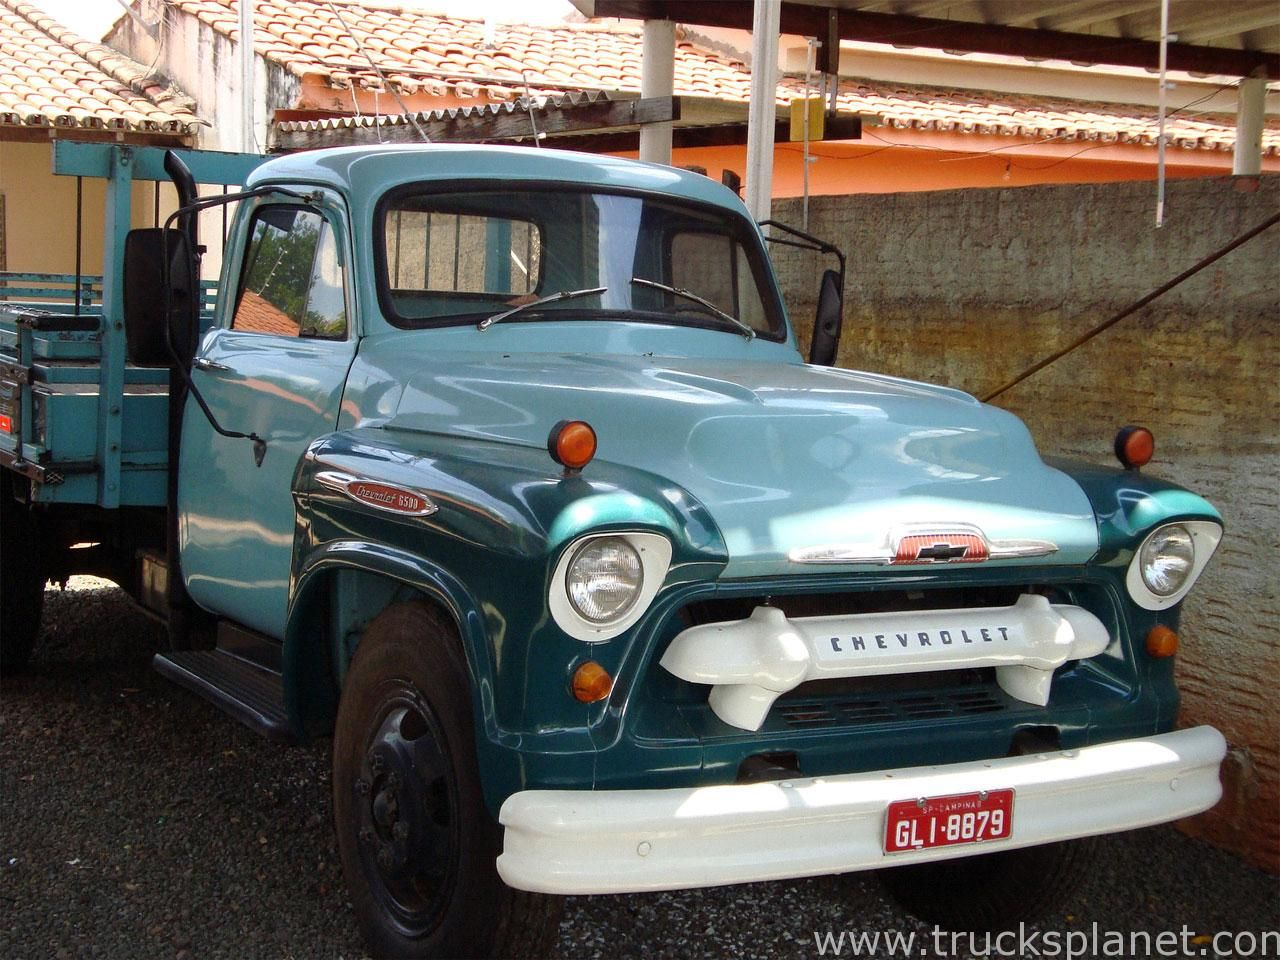 Truck 1957 chevy truck parts : 1957 brazil chevrolet truck | 1957 Chevrolet 6500 1957 Chevrolet ...